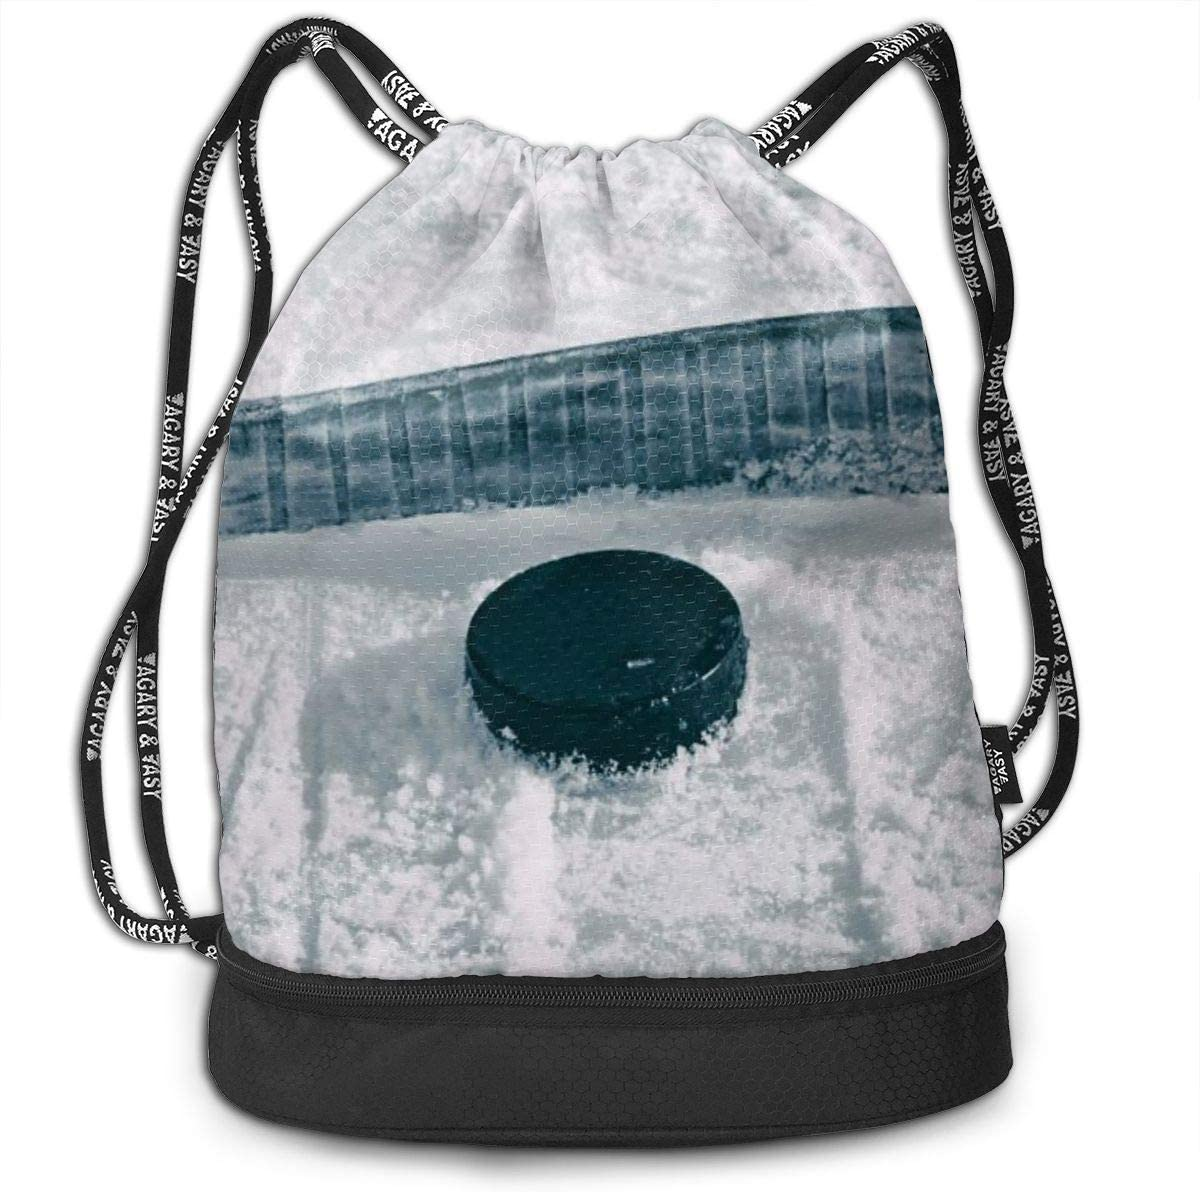 GymSack Drawstring Bag Sackpack Ice Hockey Sport Cinch Pack Simple Bundle Pocke Backpack For Men Women